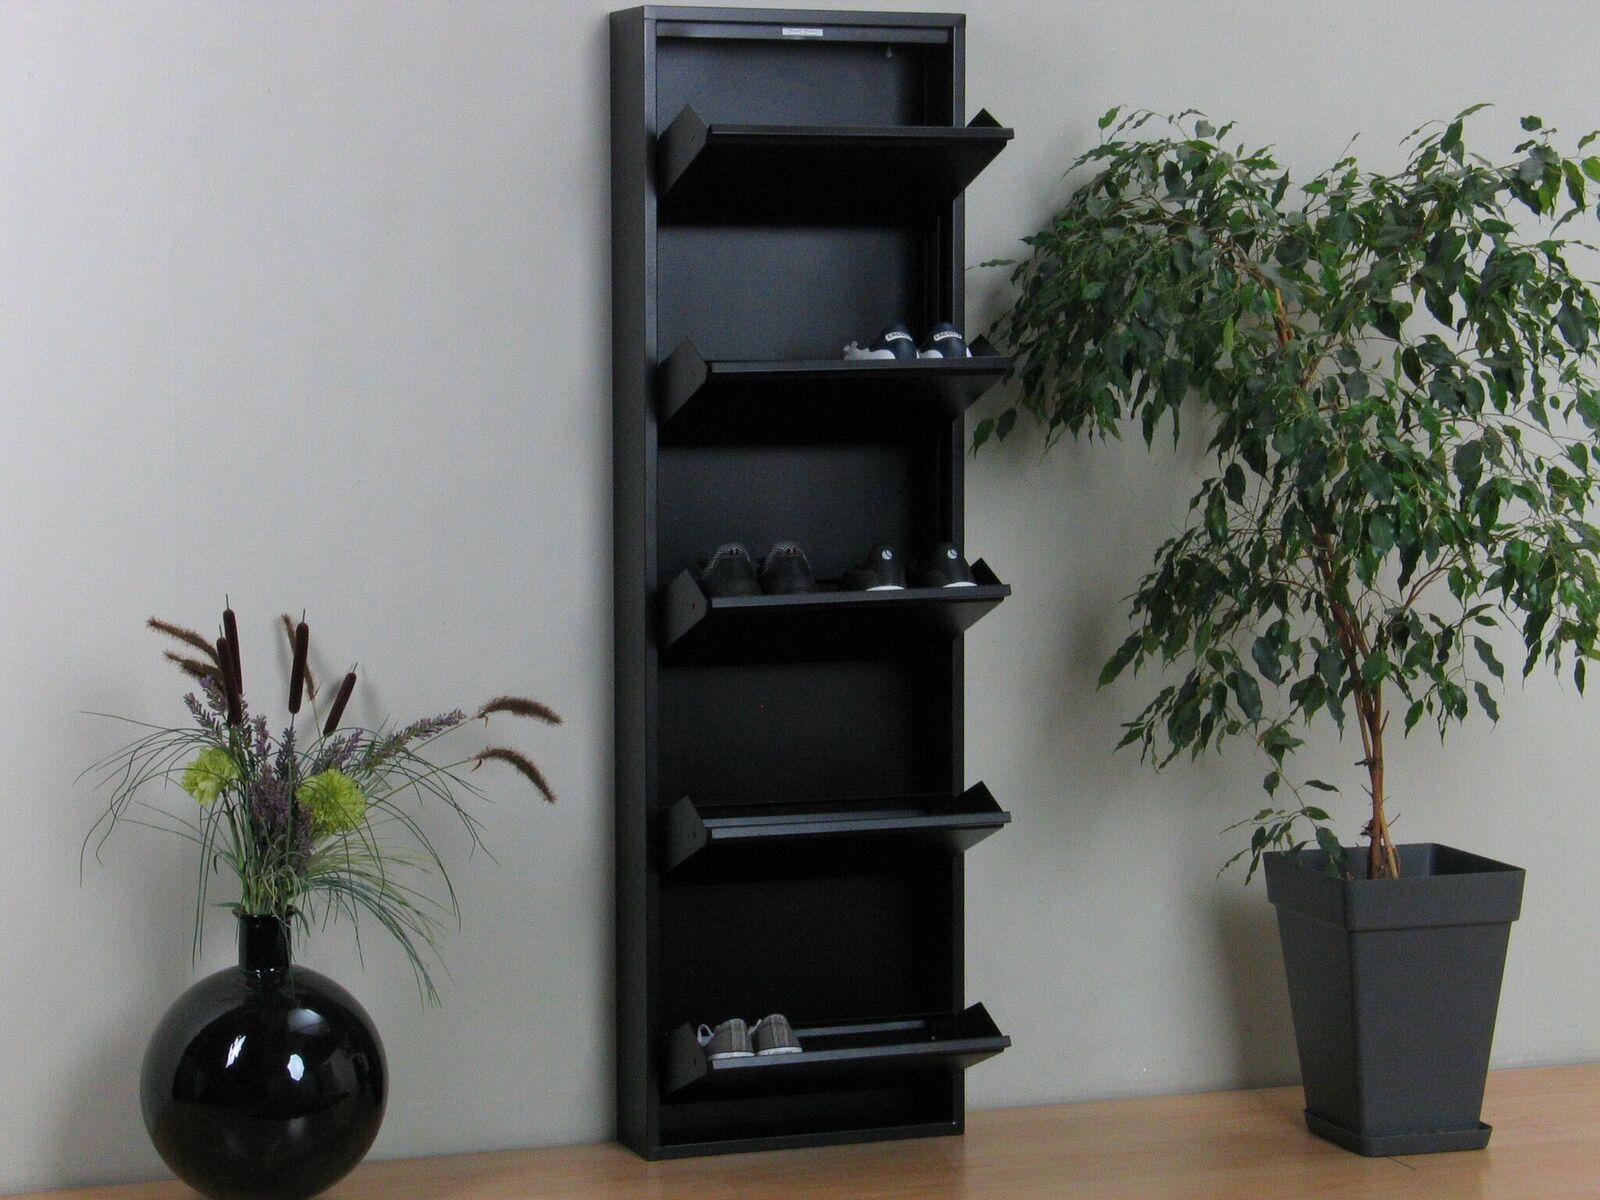 schuhschrank pisa 5 klappen metall schuhkipper schuhregal. Black Bedroom Furniture Sets. Home Design Ideas